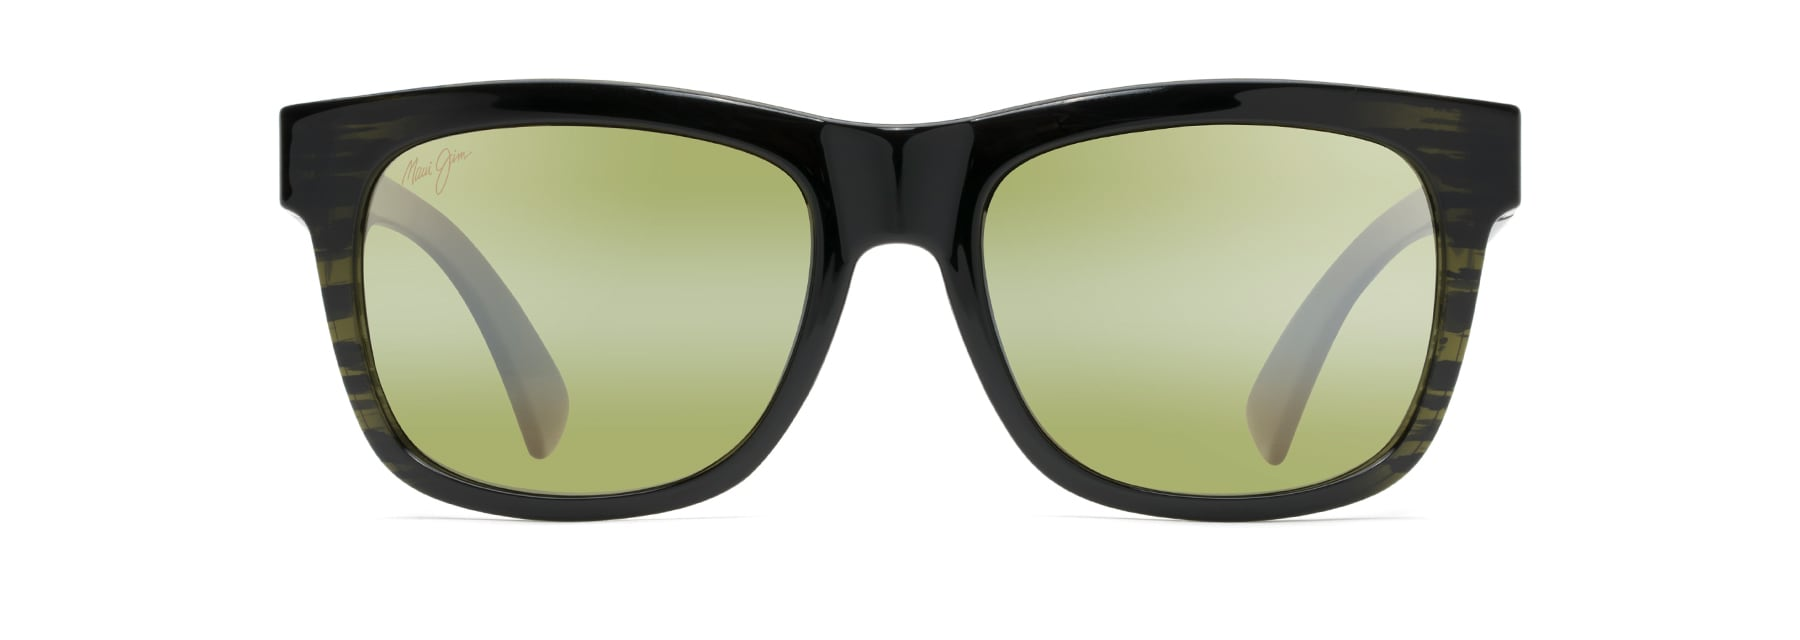 d0fdec77312a Snapback Polarised Sunglasses | Maui Jim®